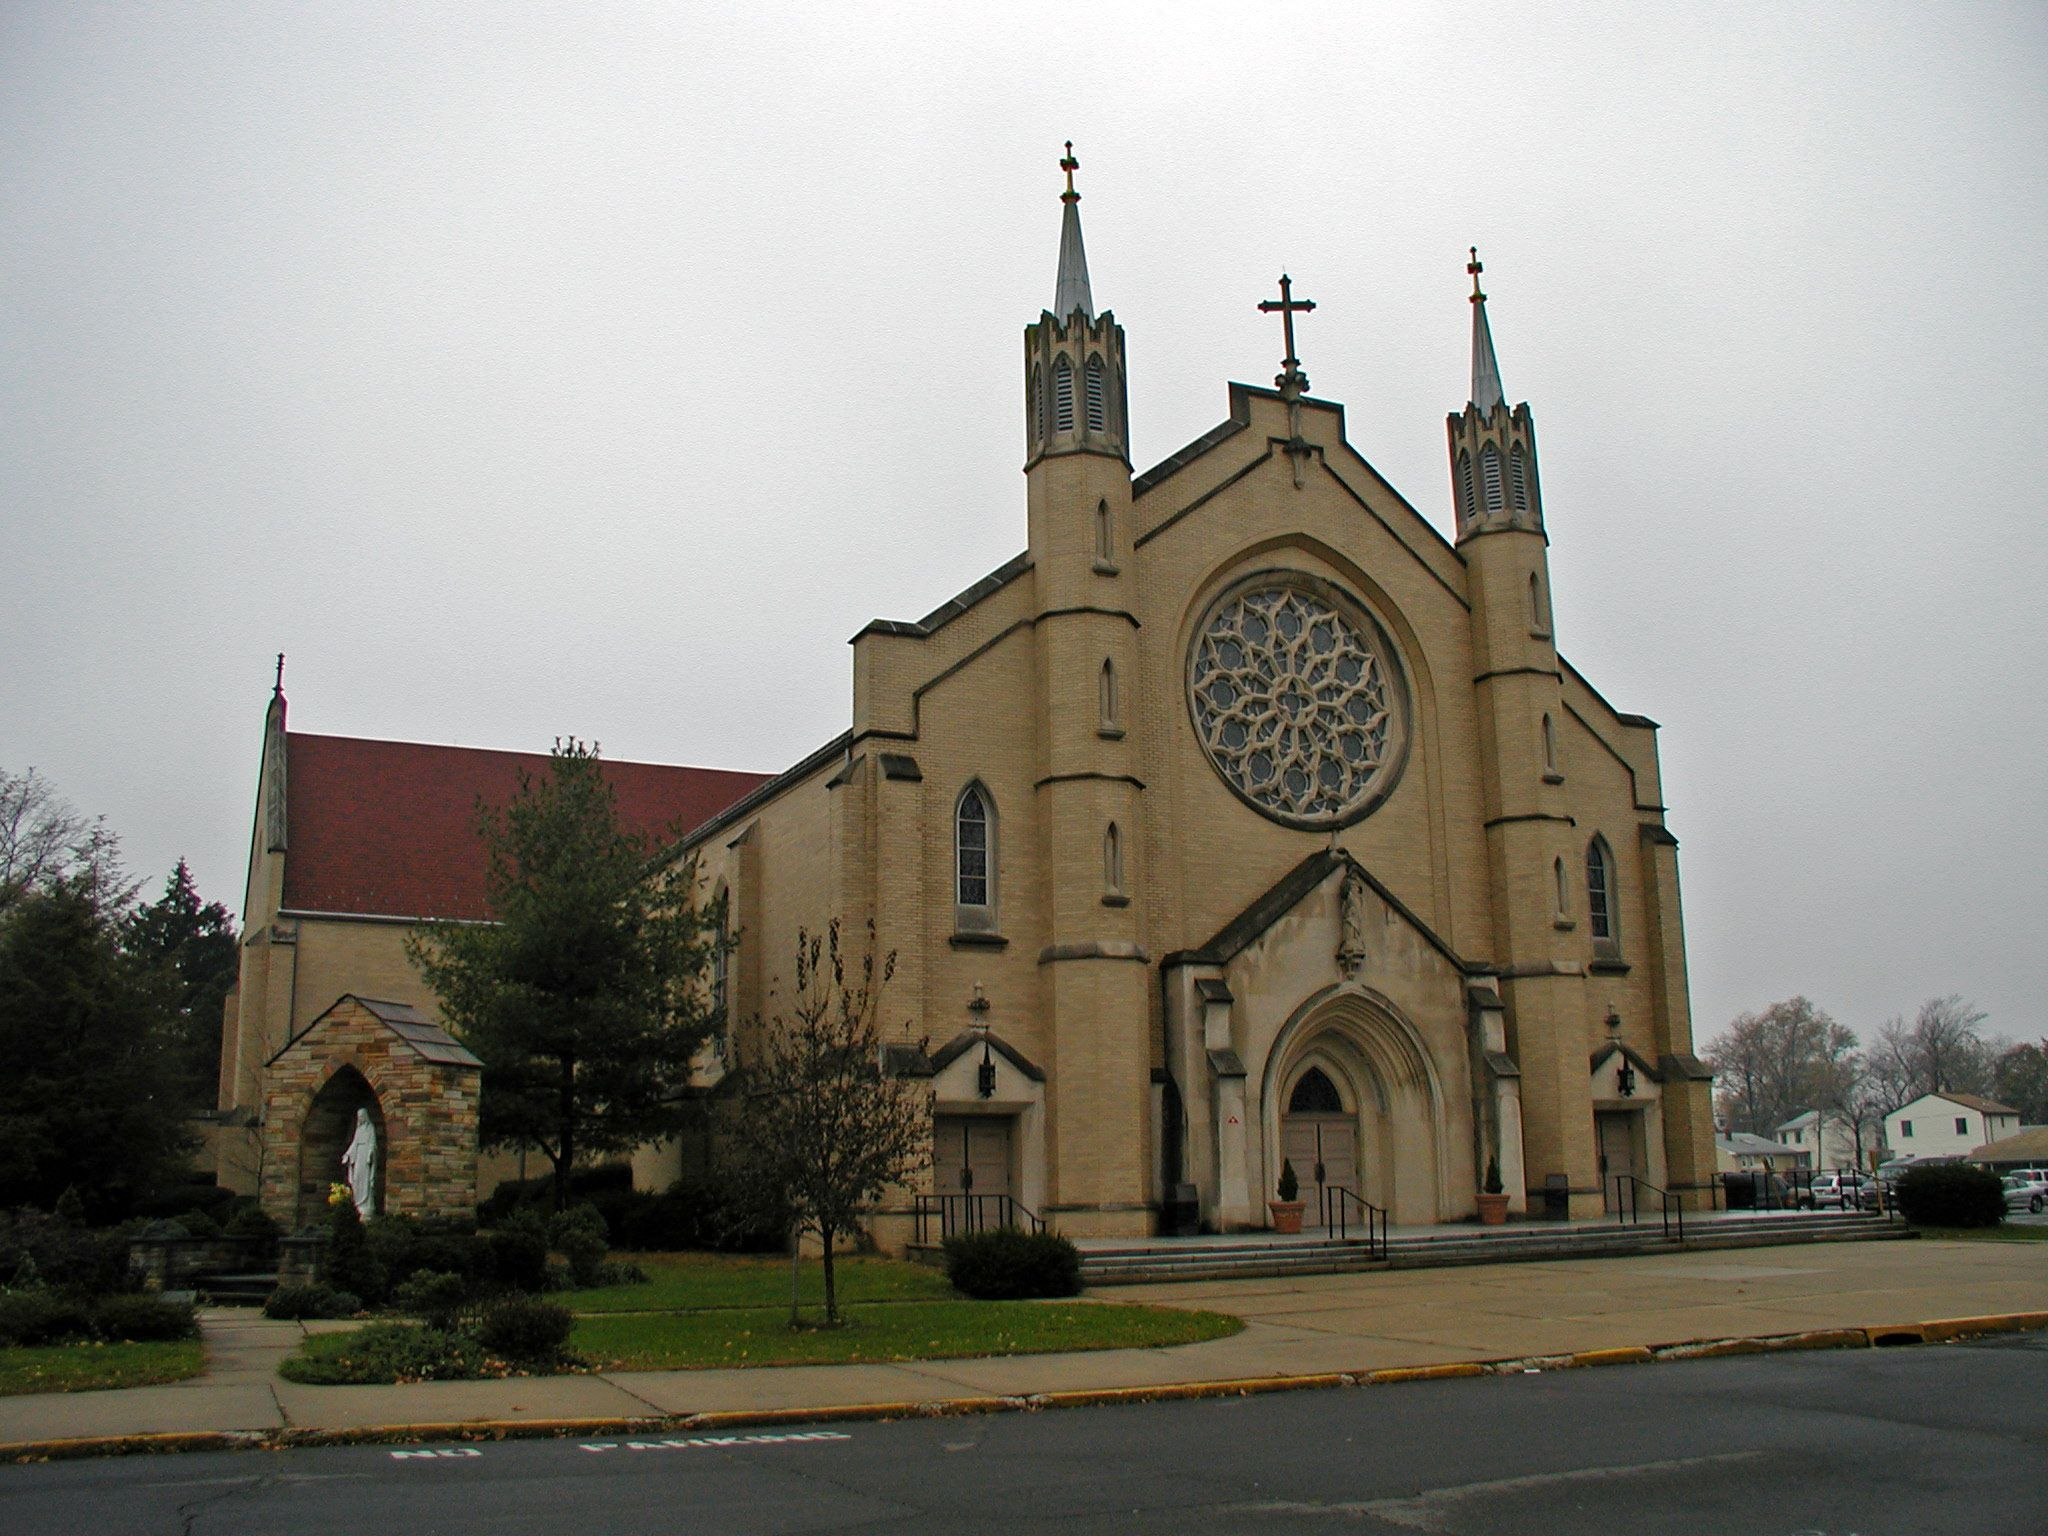 Sacred Heart, South Plainfield NJ - many family photos taken on ...